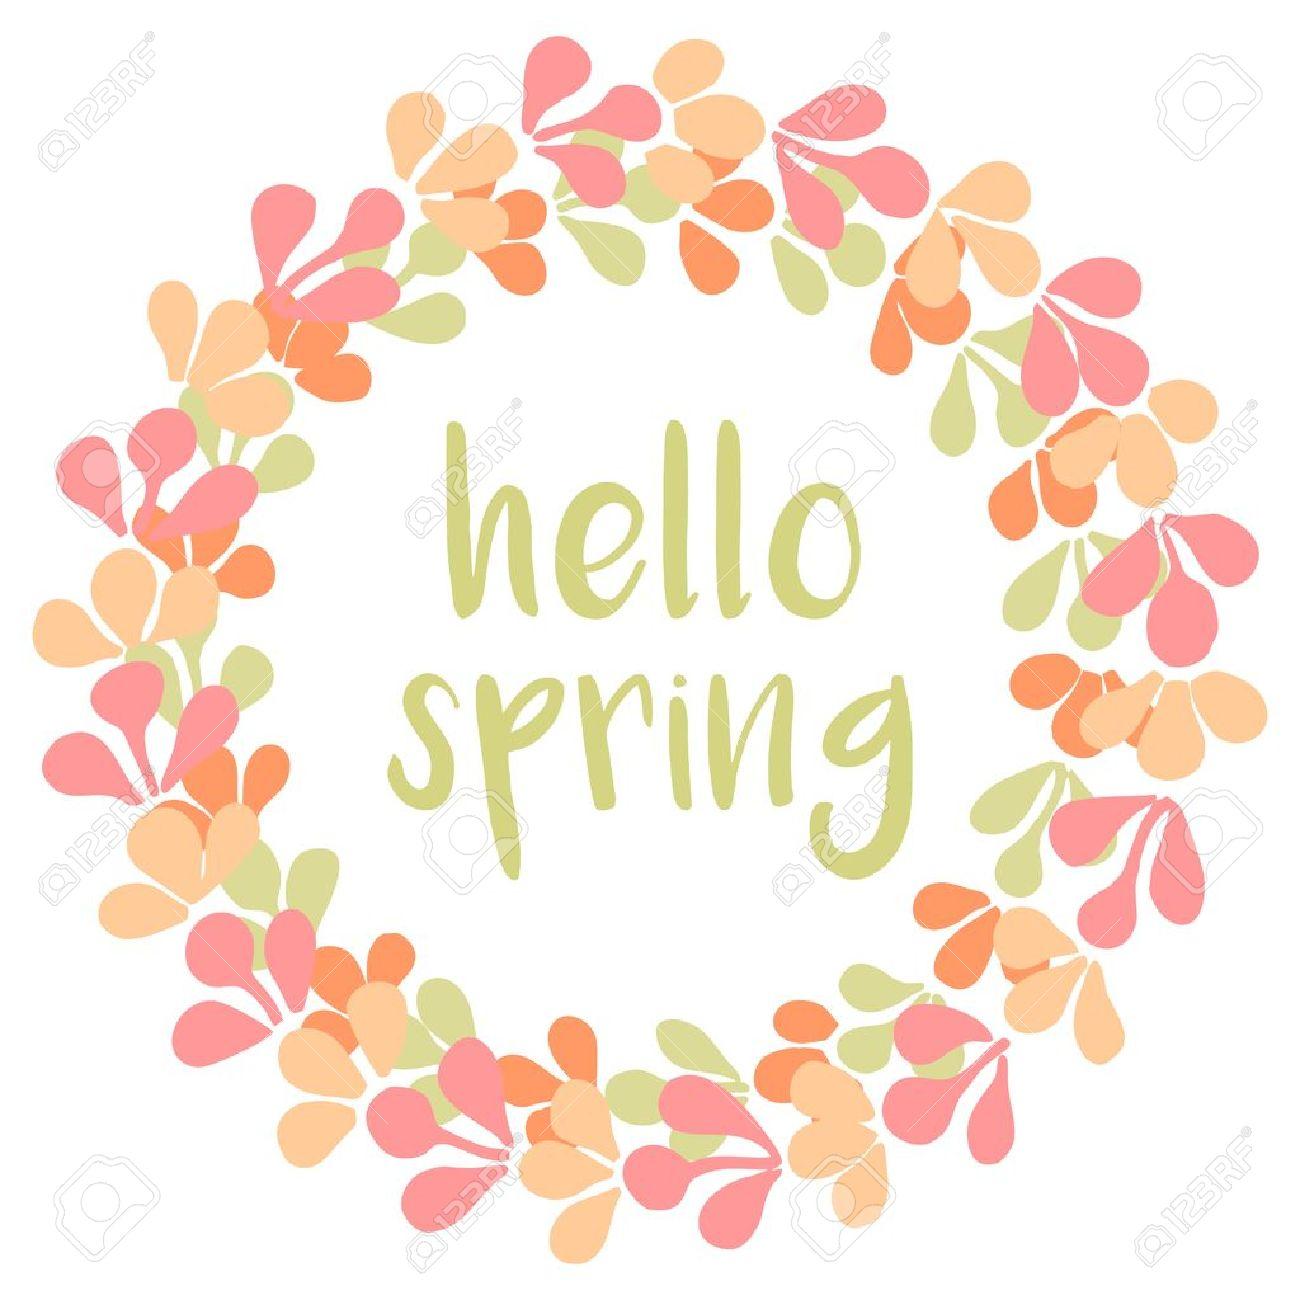 Ordinaire Hello Spring Watercolor Pastel Wreath Vector Card Stock Vector   49725442